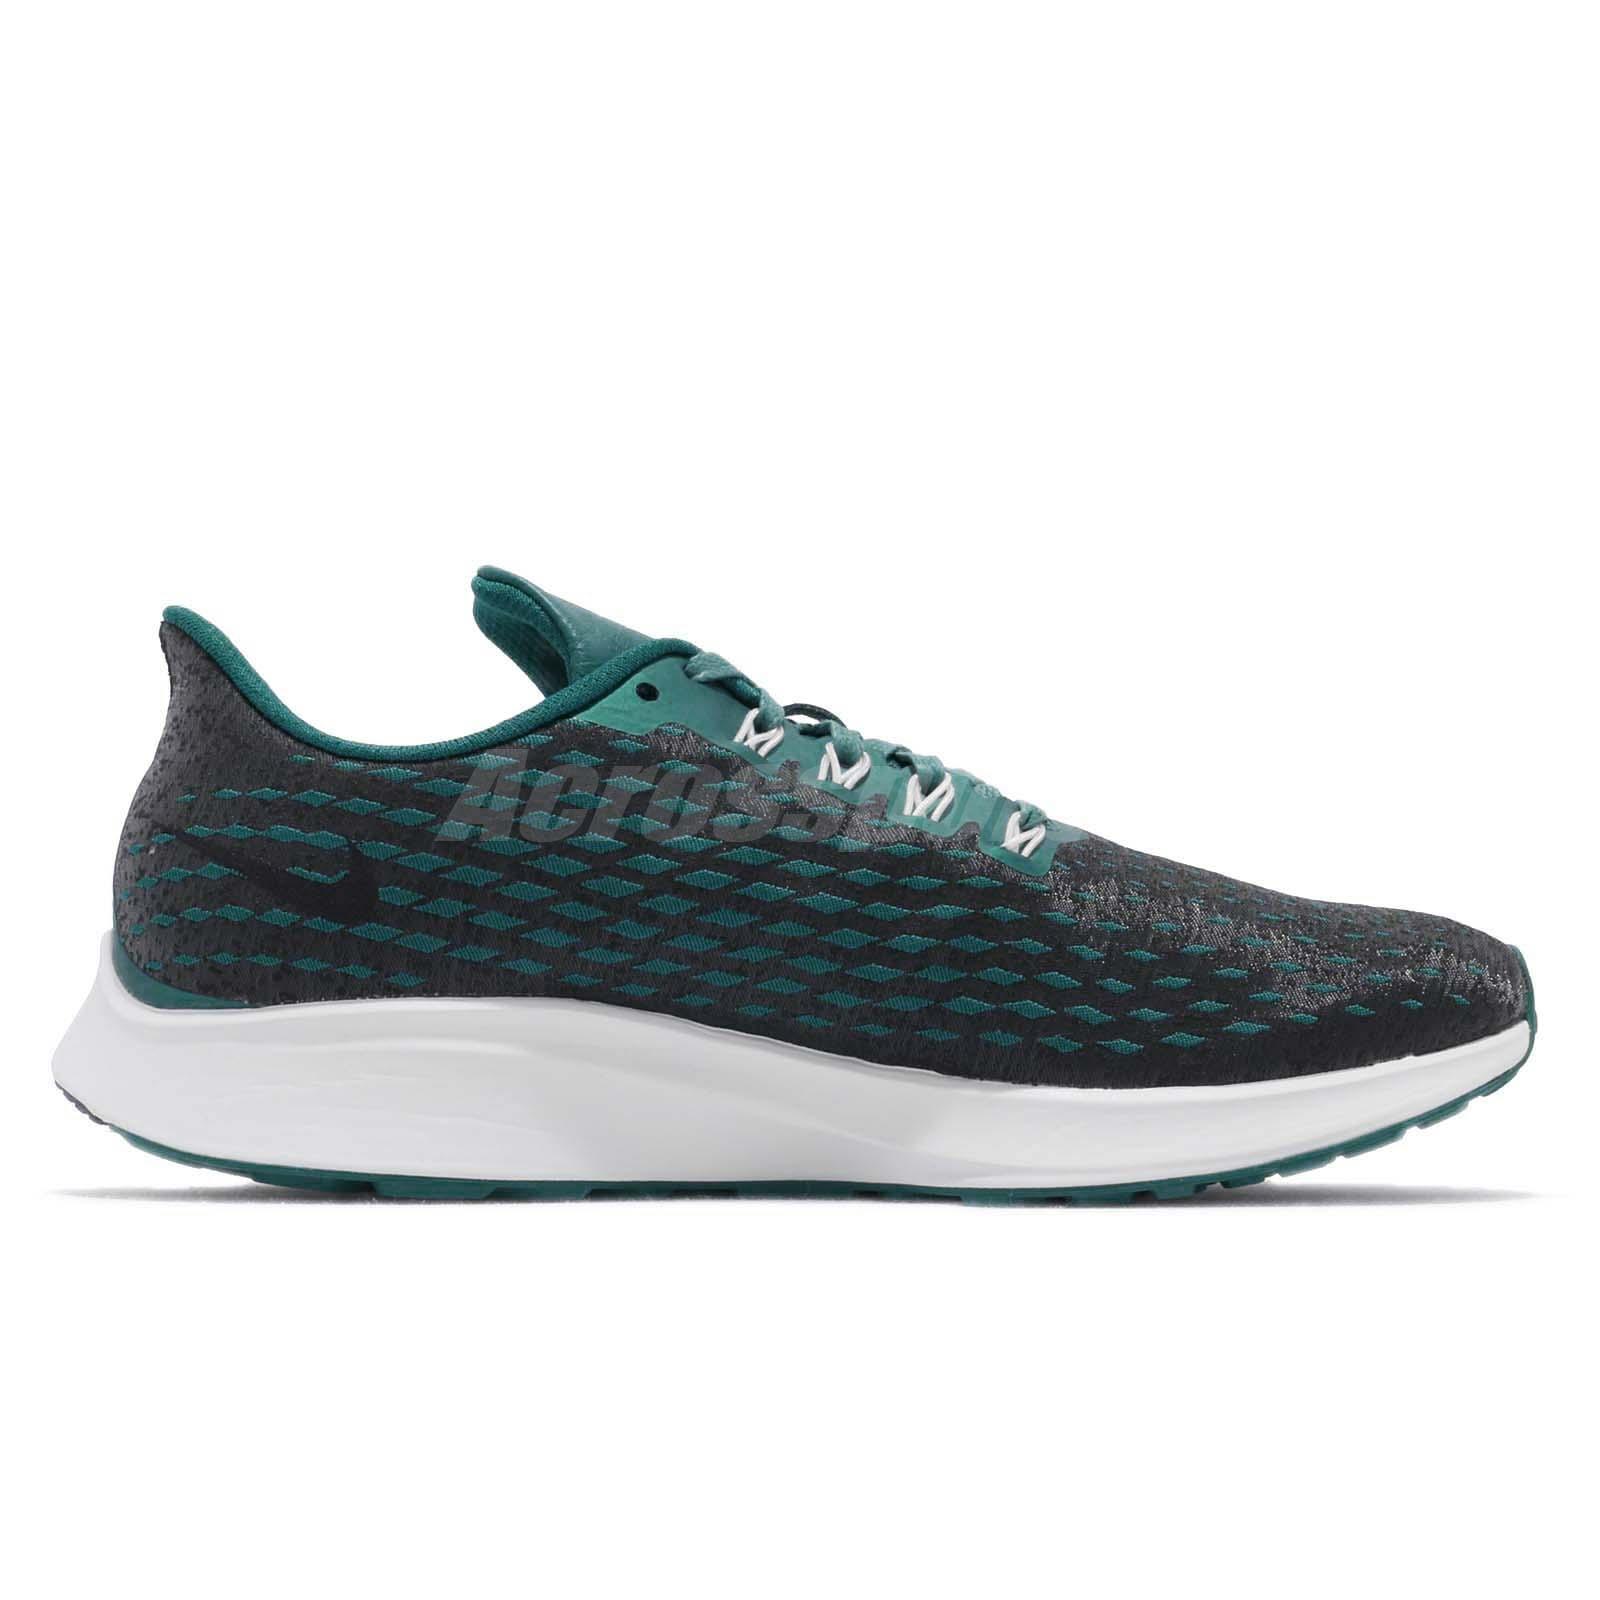 a89b2a68c7ca Nike Wmns Air Zoom Pegasus 35 PRM Geode Teal Green Women Running ...